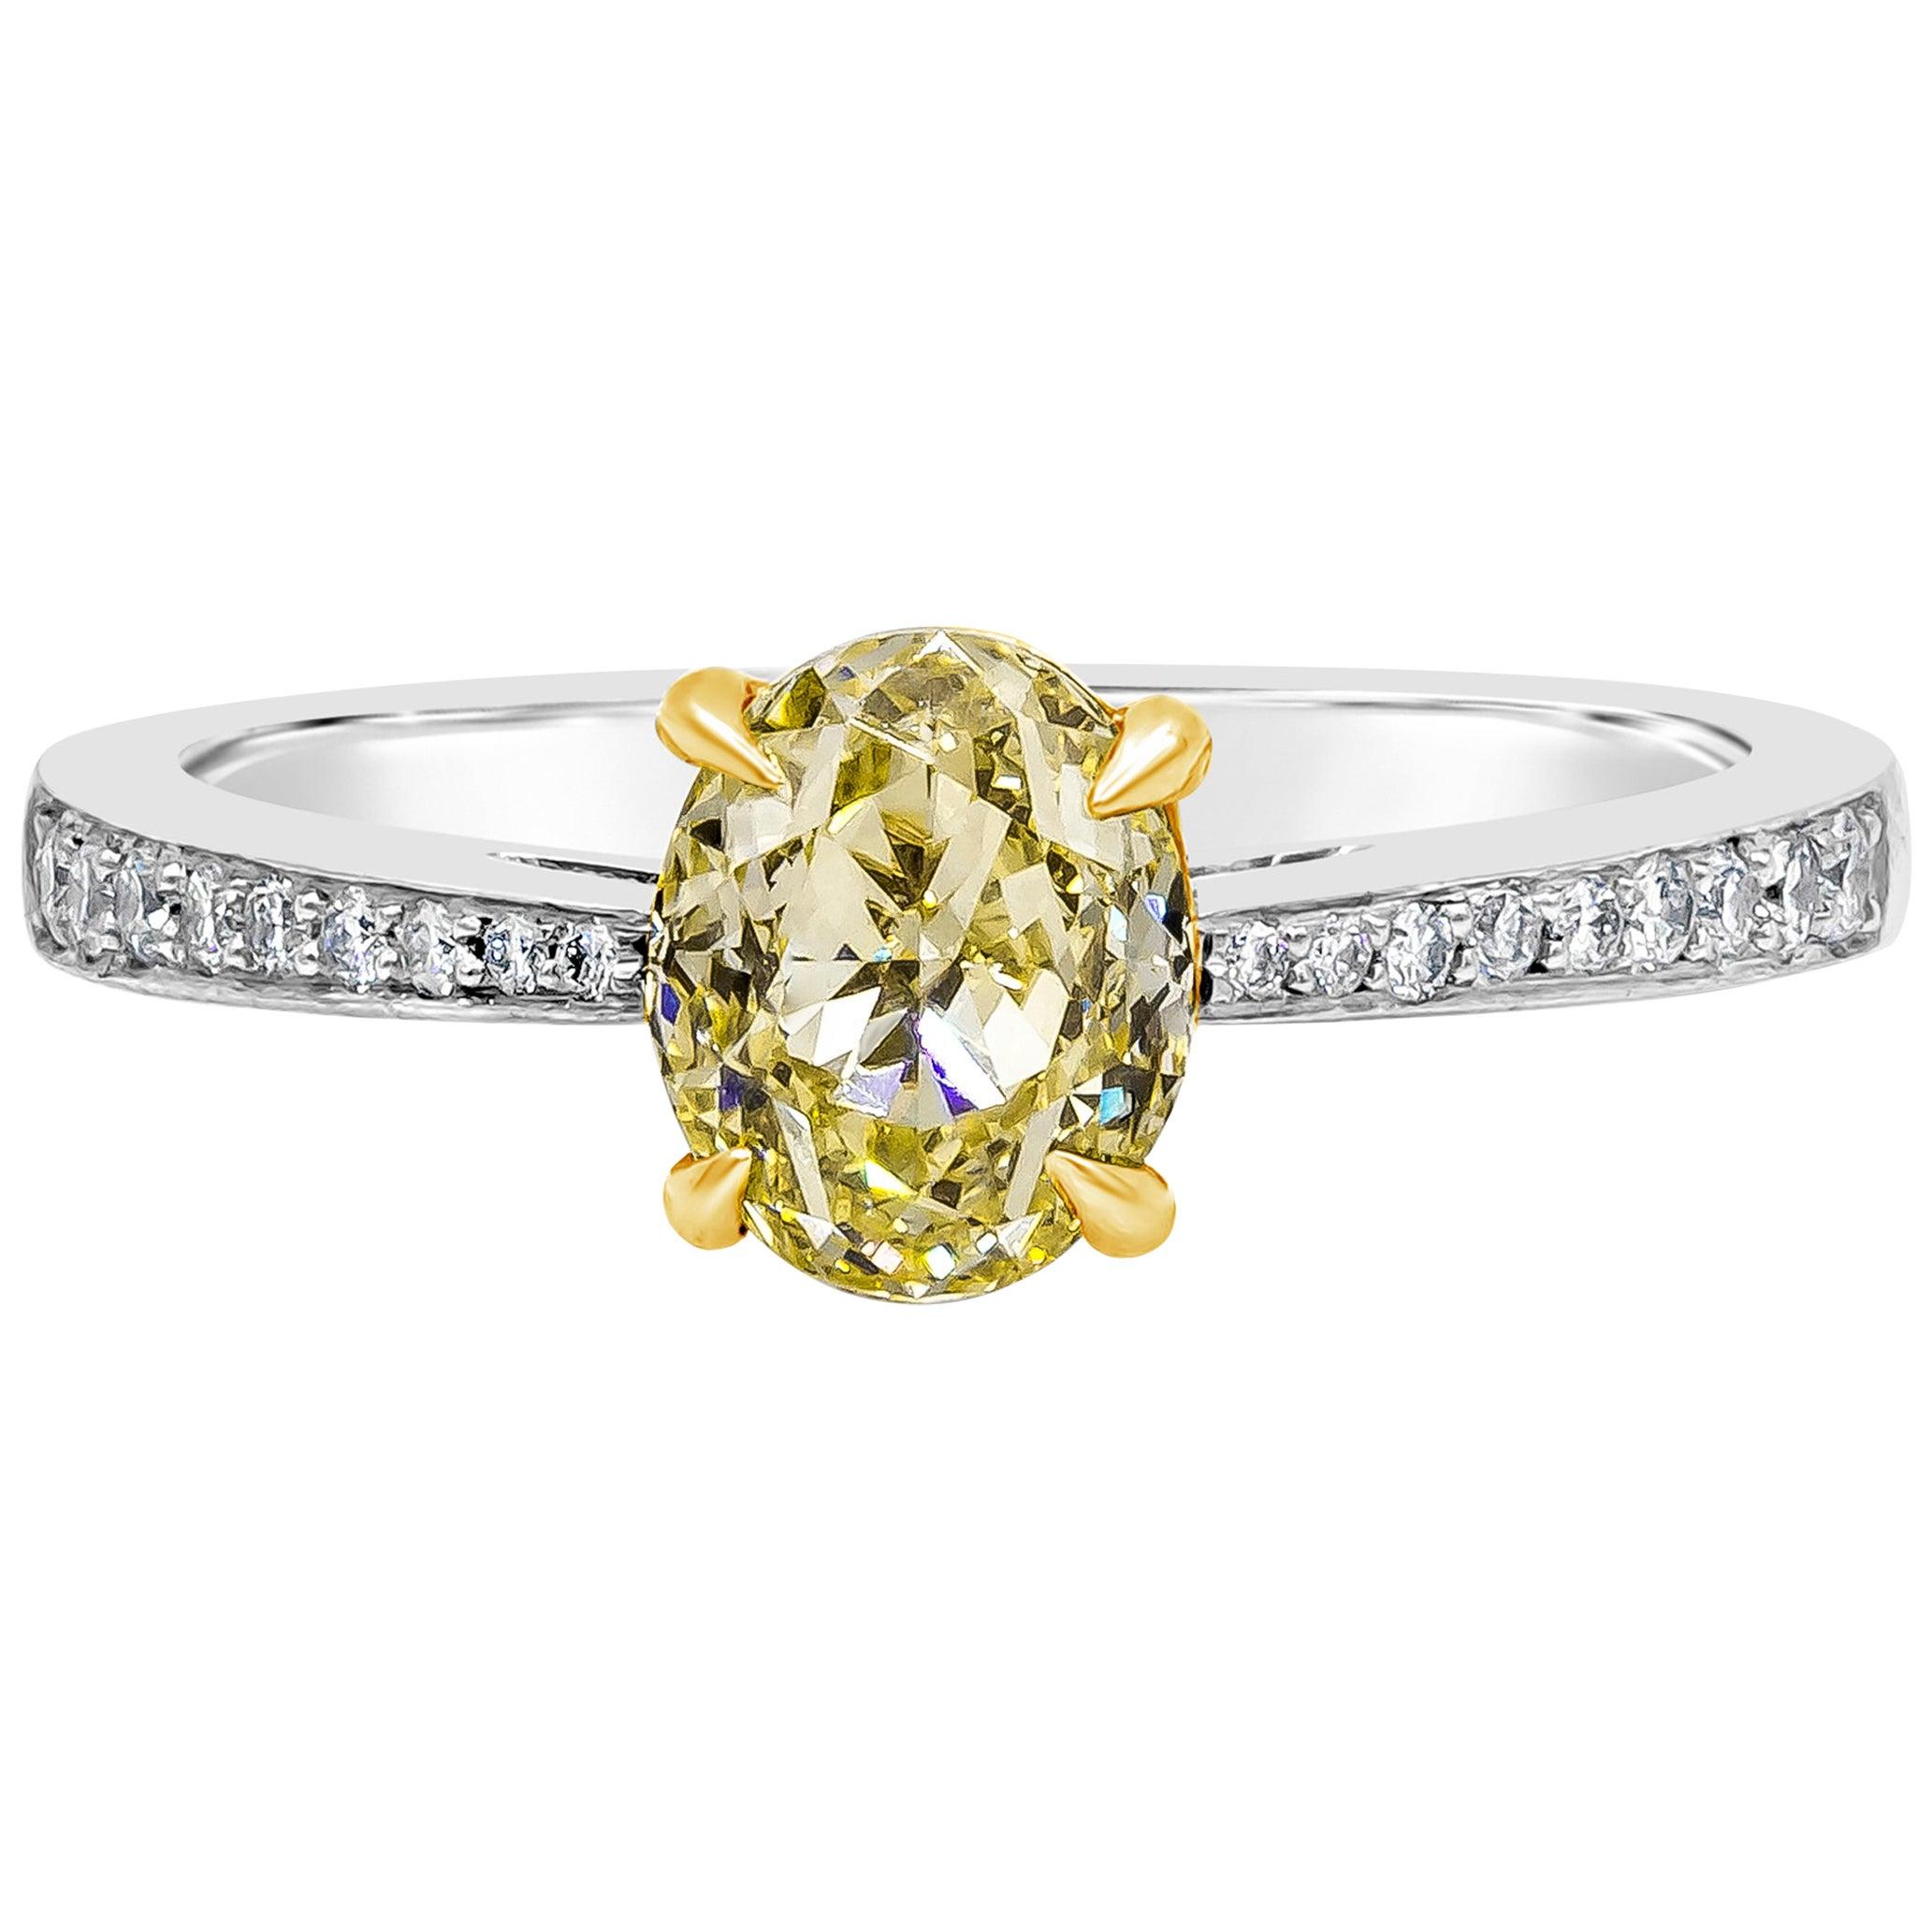 Roman Malakov GIA Certified Oval Cut Yellow Diamond Engagement Ring